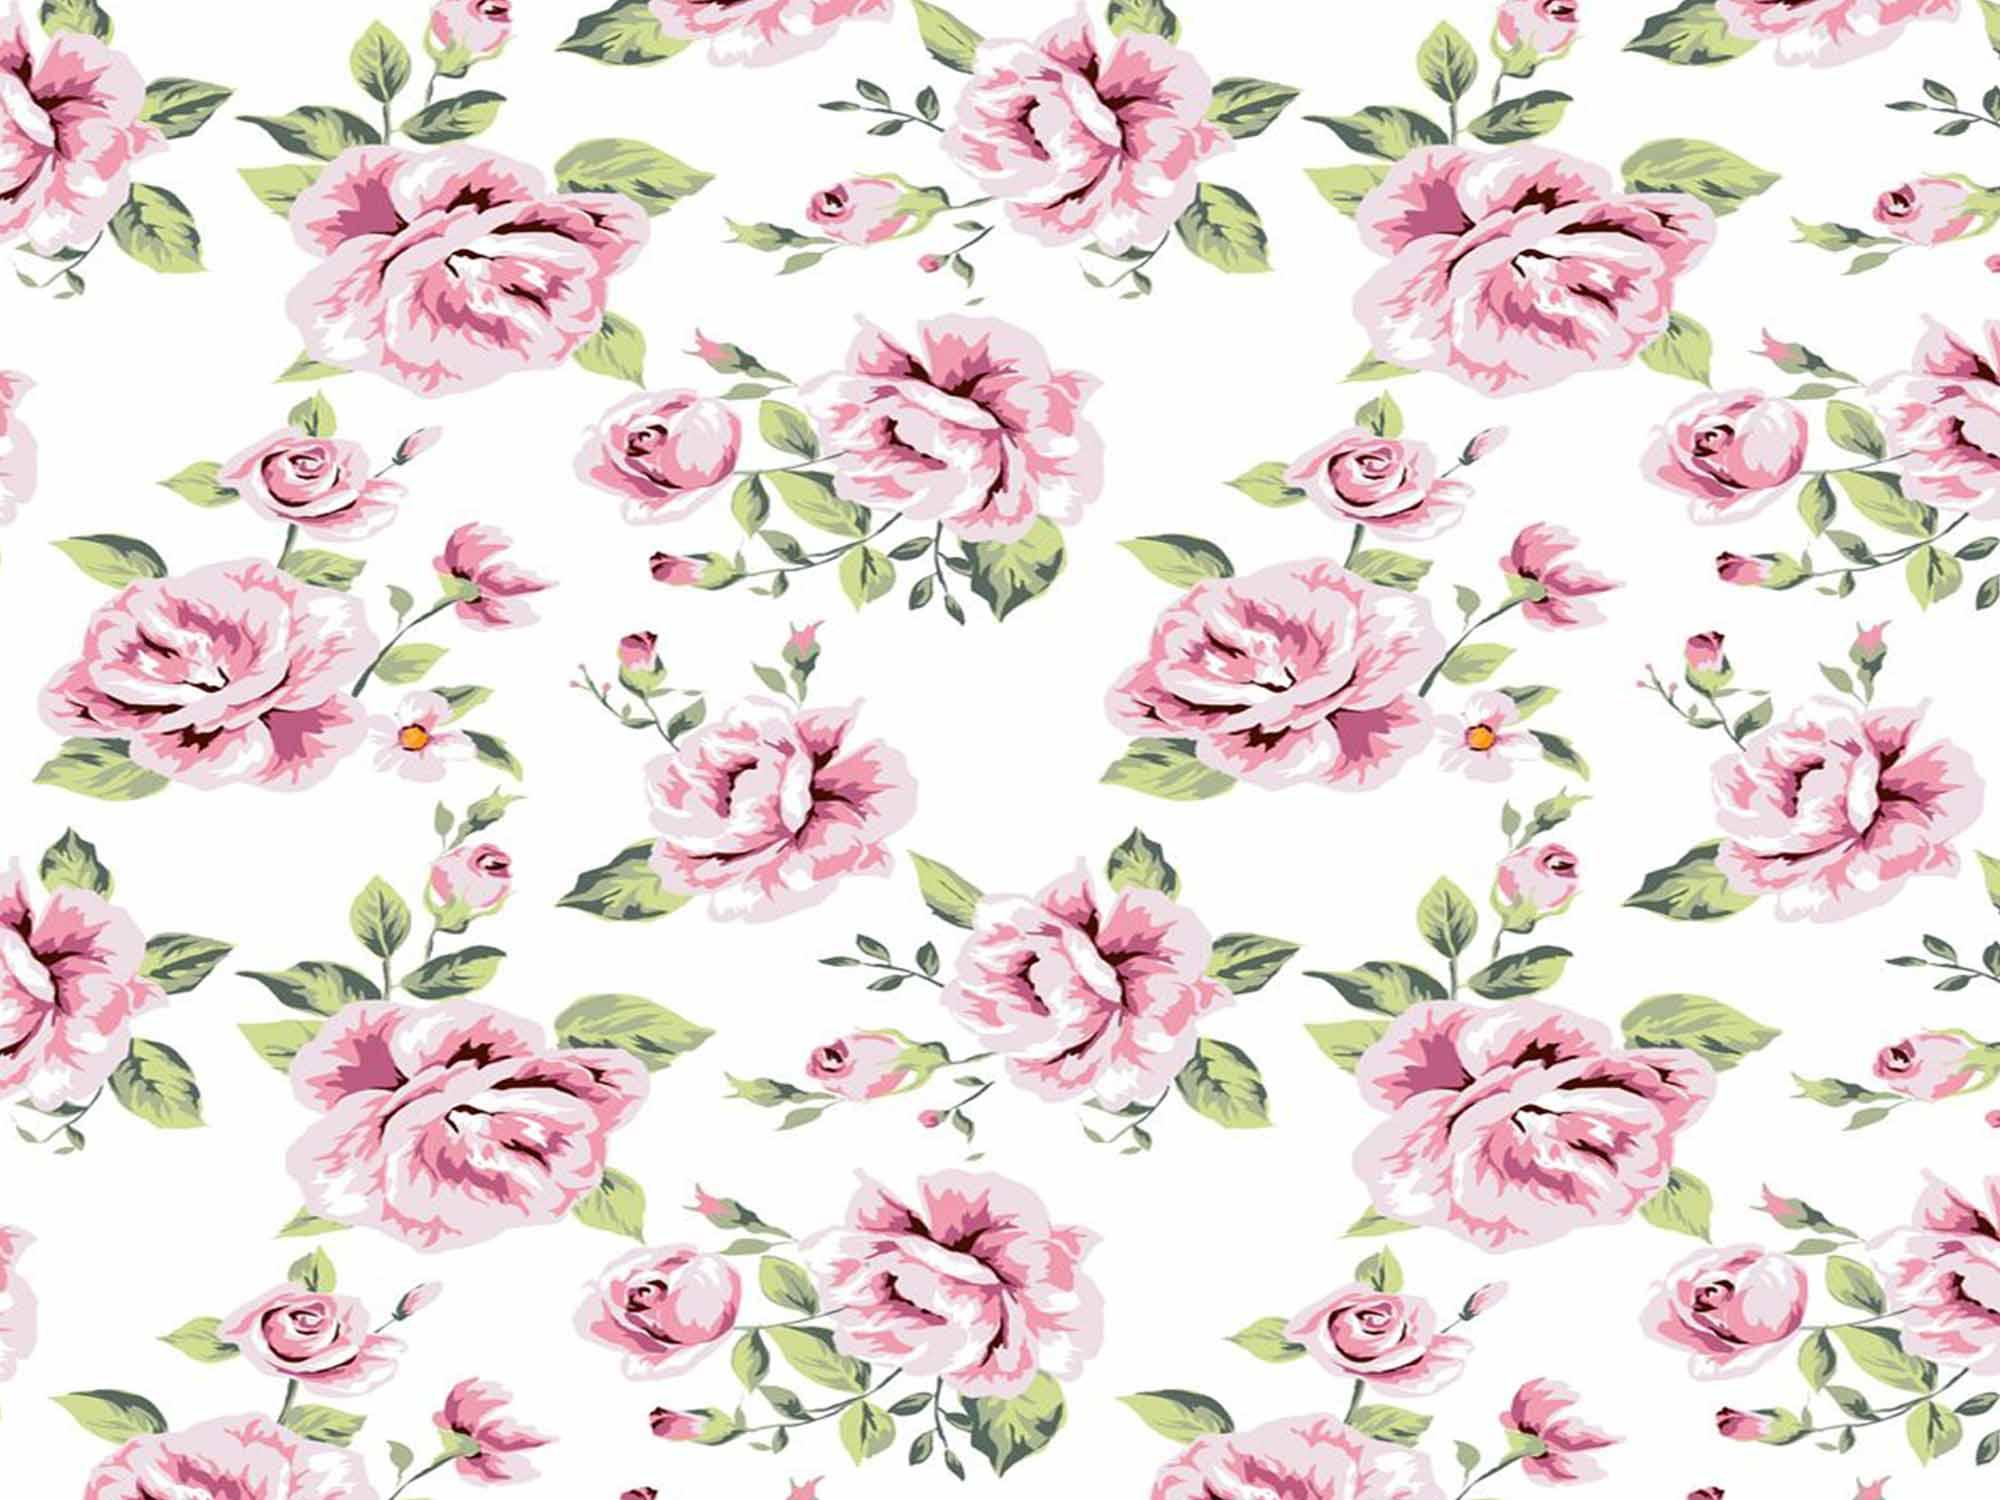 Papel de Parede Floral 0011 - Adesivos de Parede  - Paredes Decoradas